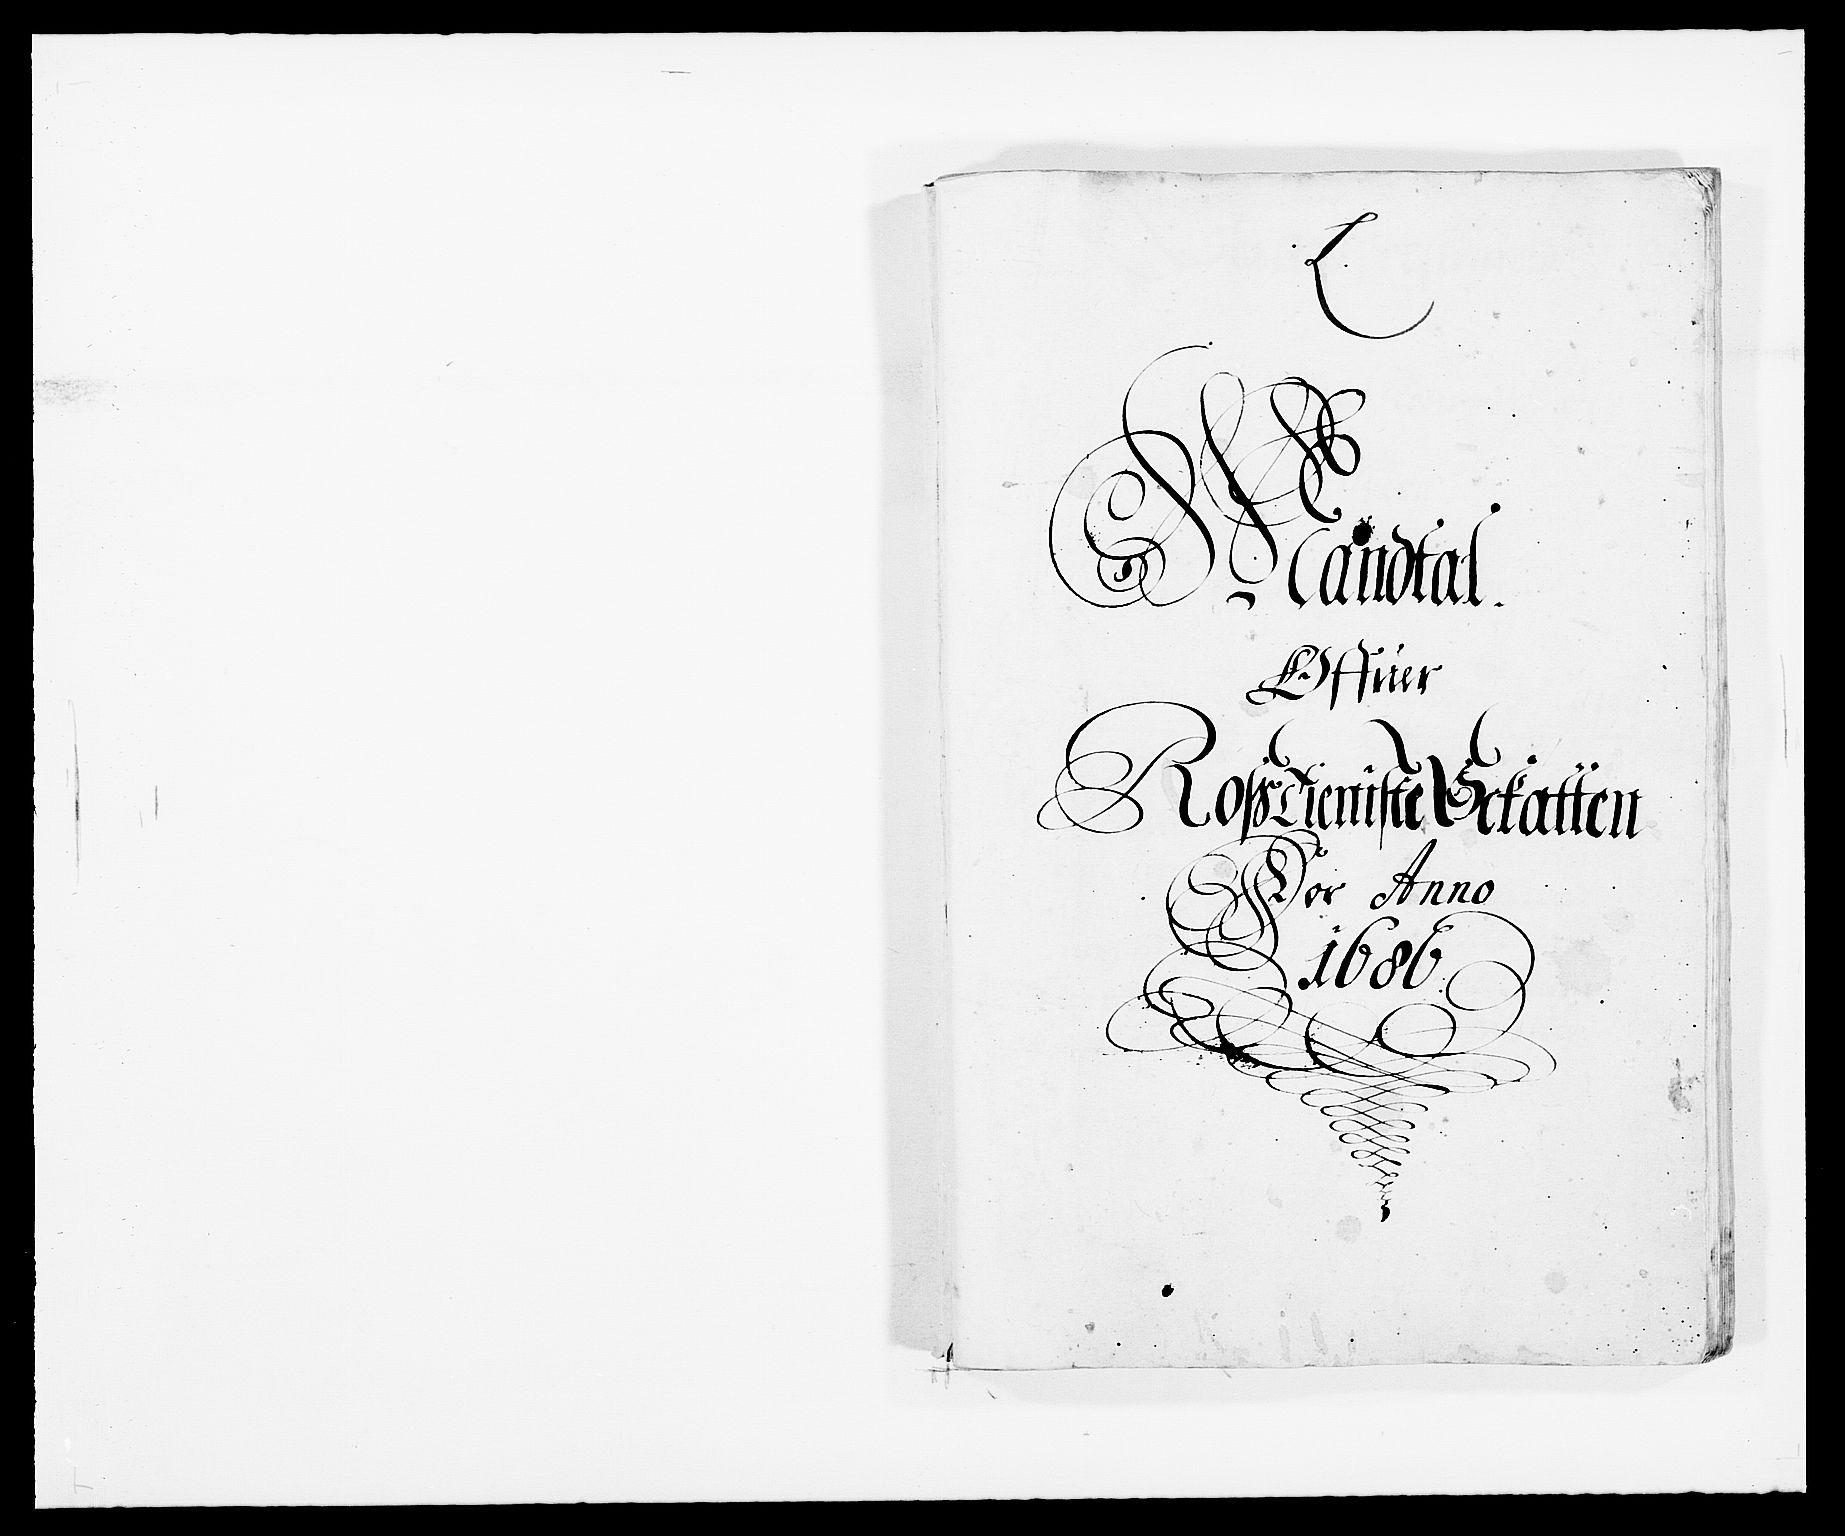 RA, Rentekammeret inntil 1814, Reviderte regnskaper, Fogderegnskap, R32/L1857: Fogderegnskap Jarlsberg grevskap, 1686-1690, s. 415